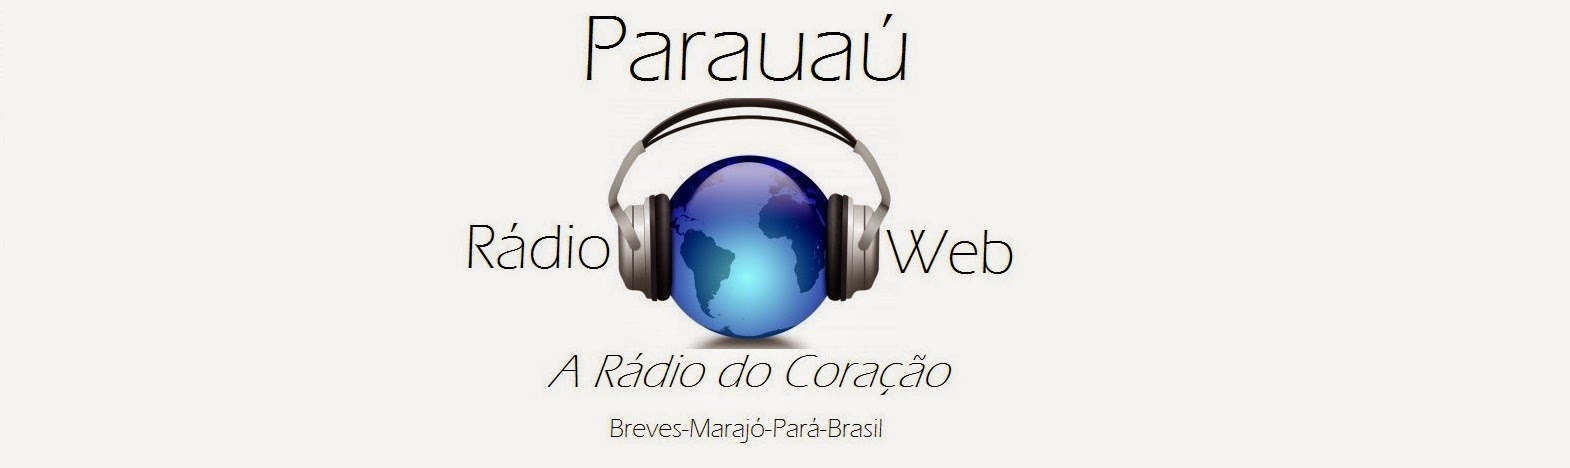 Parauaú Rádio Web